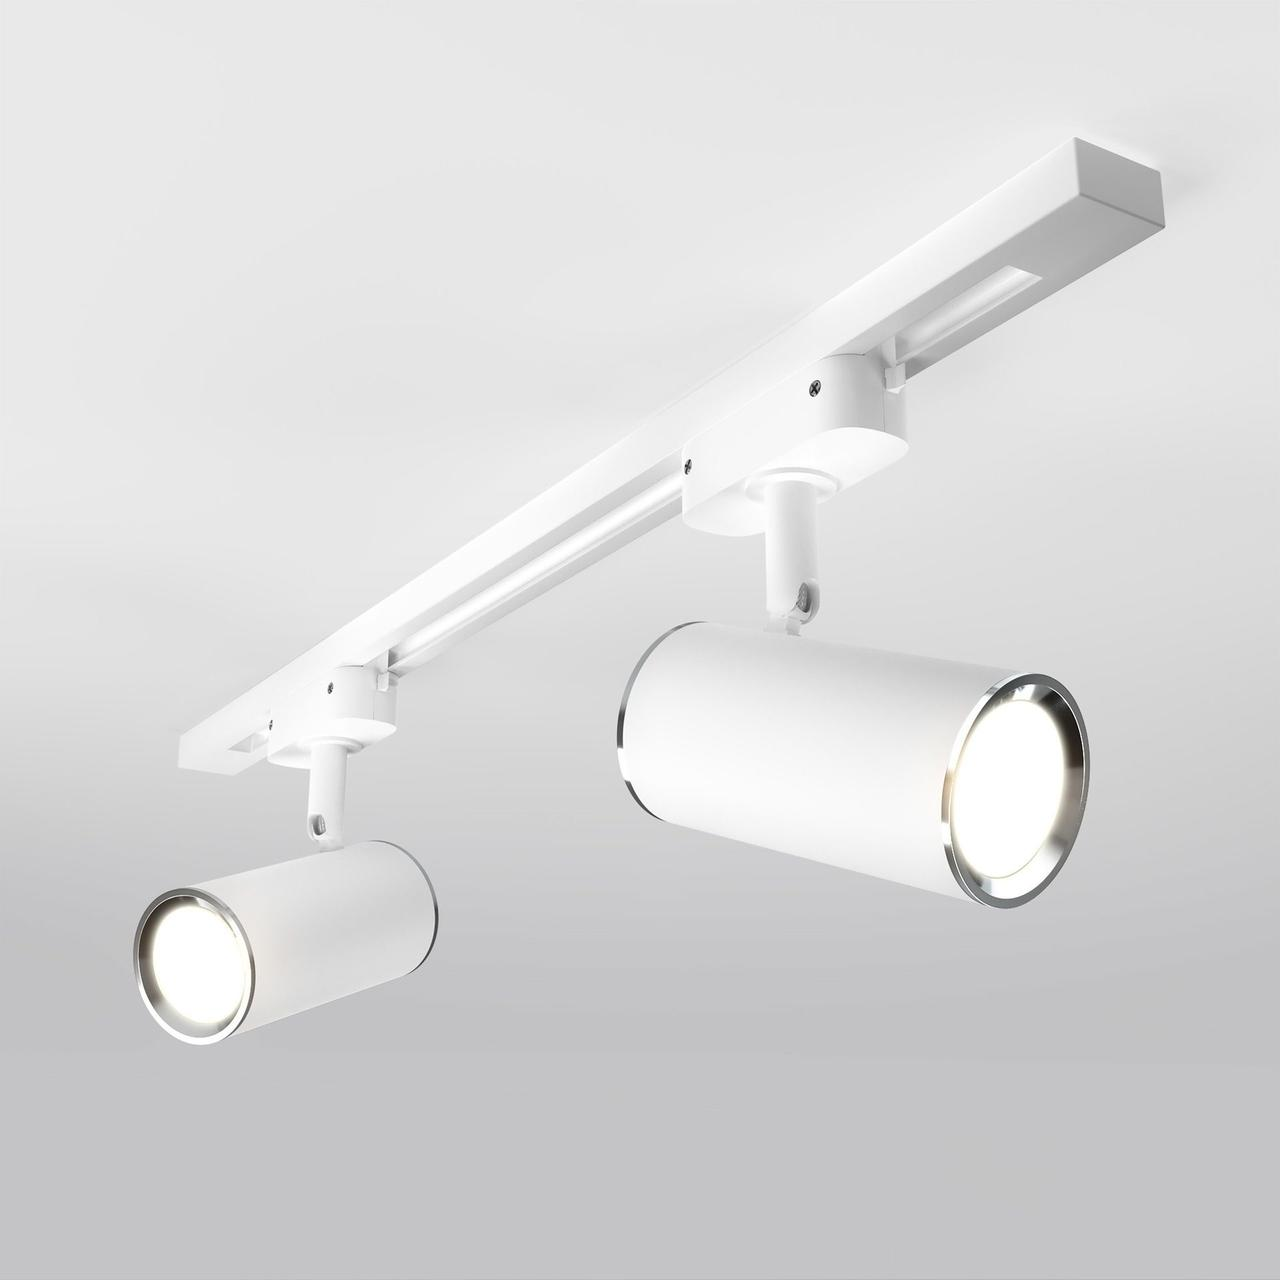 MRL 1002 / Светильник потолочный Rutero GU10 ,белый